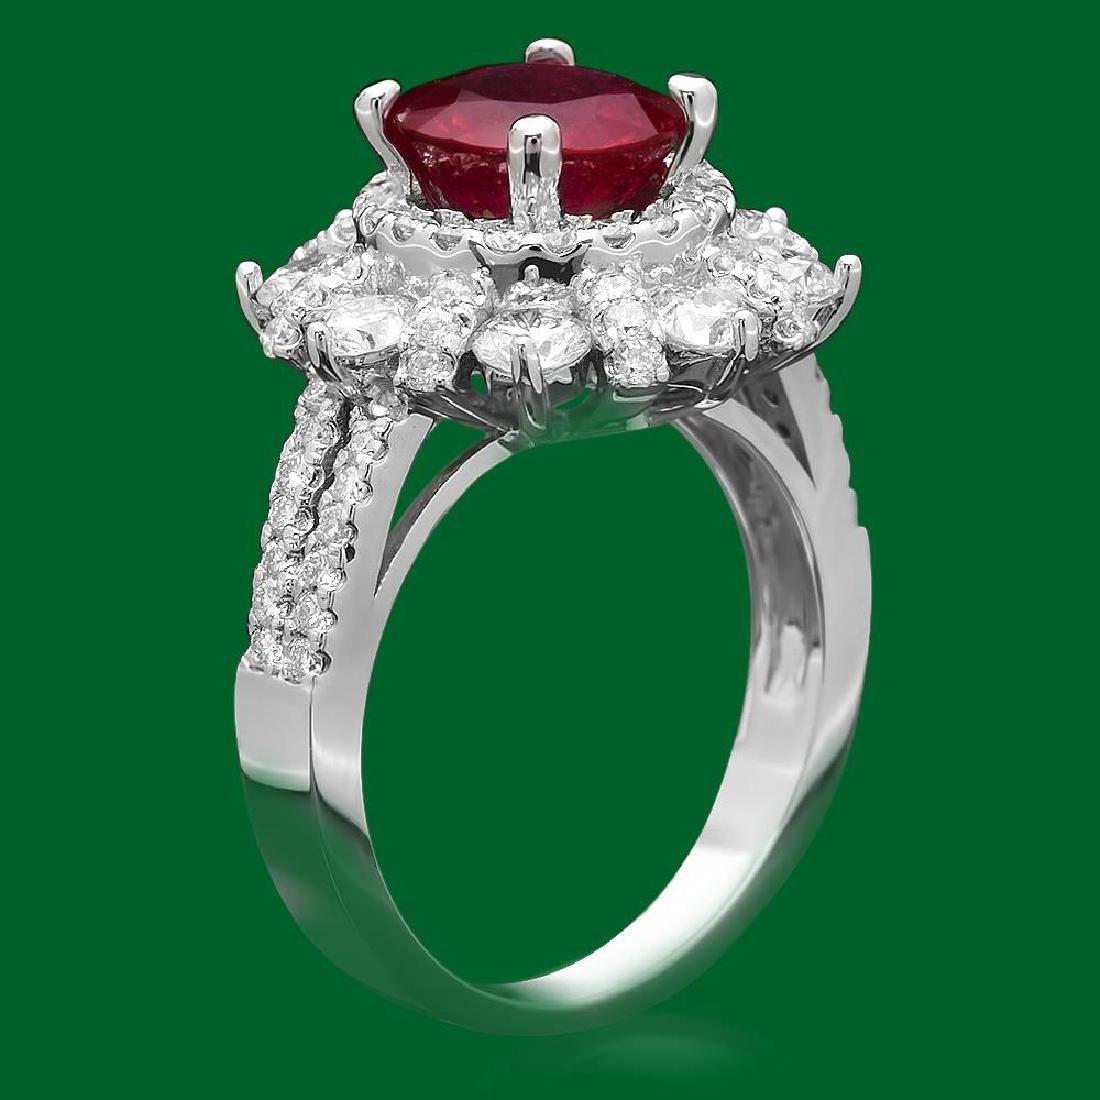 14k Gold 2.52ct Ruby 1.90ct Diamond Ring - 2